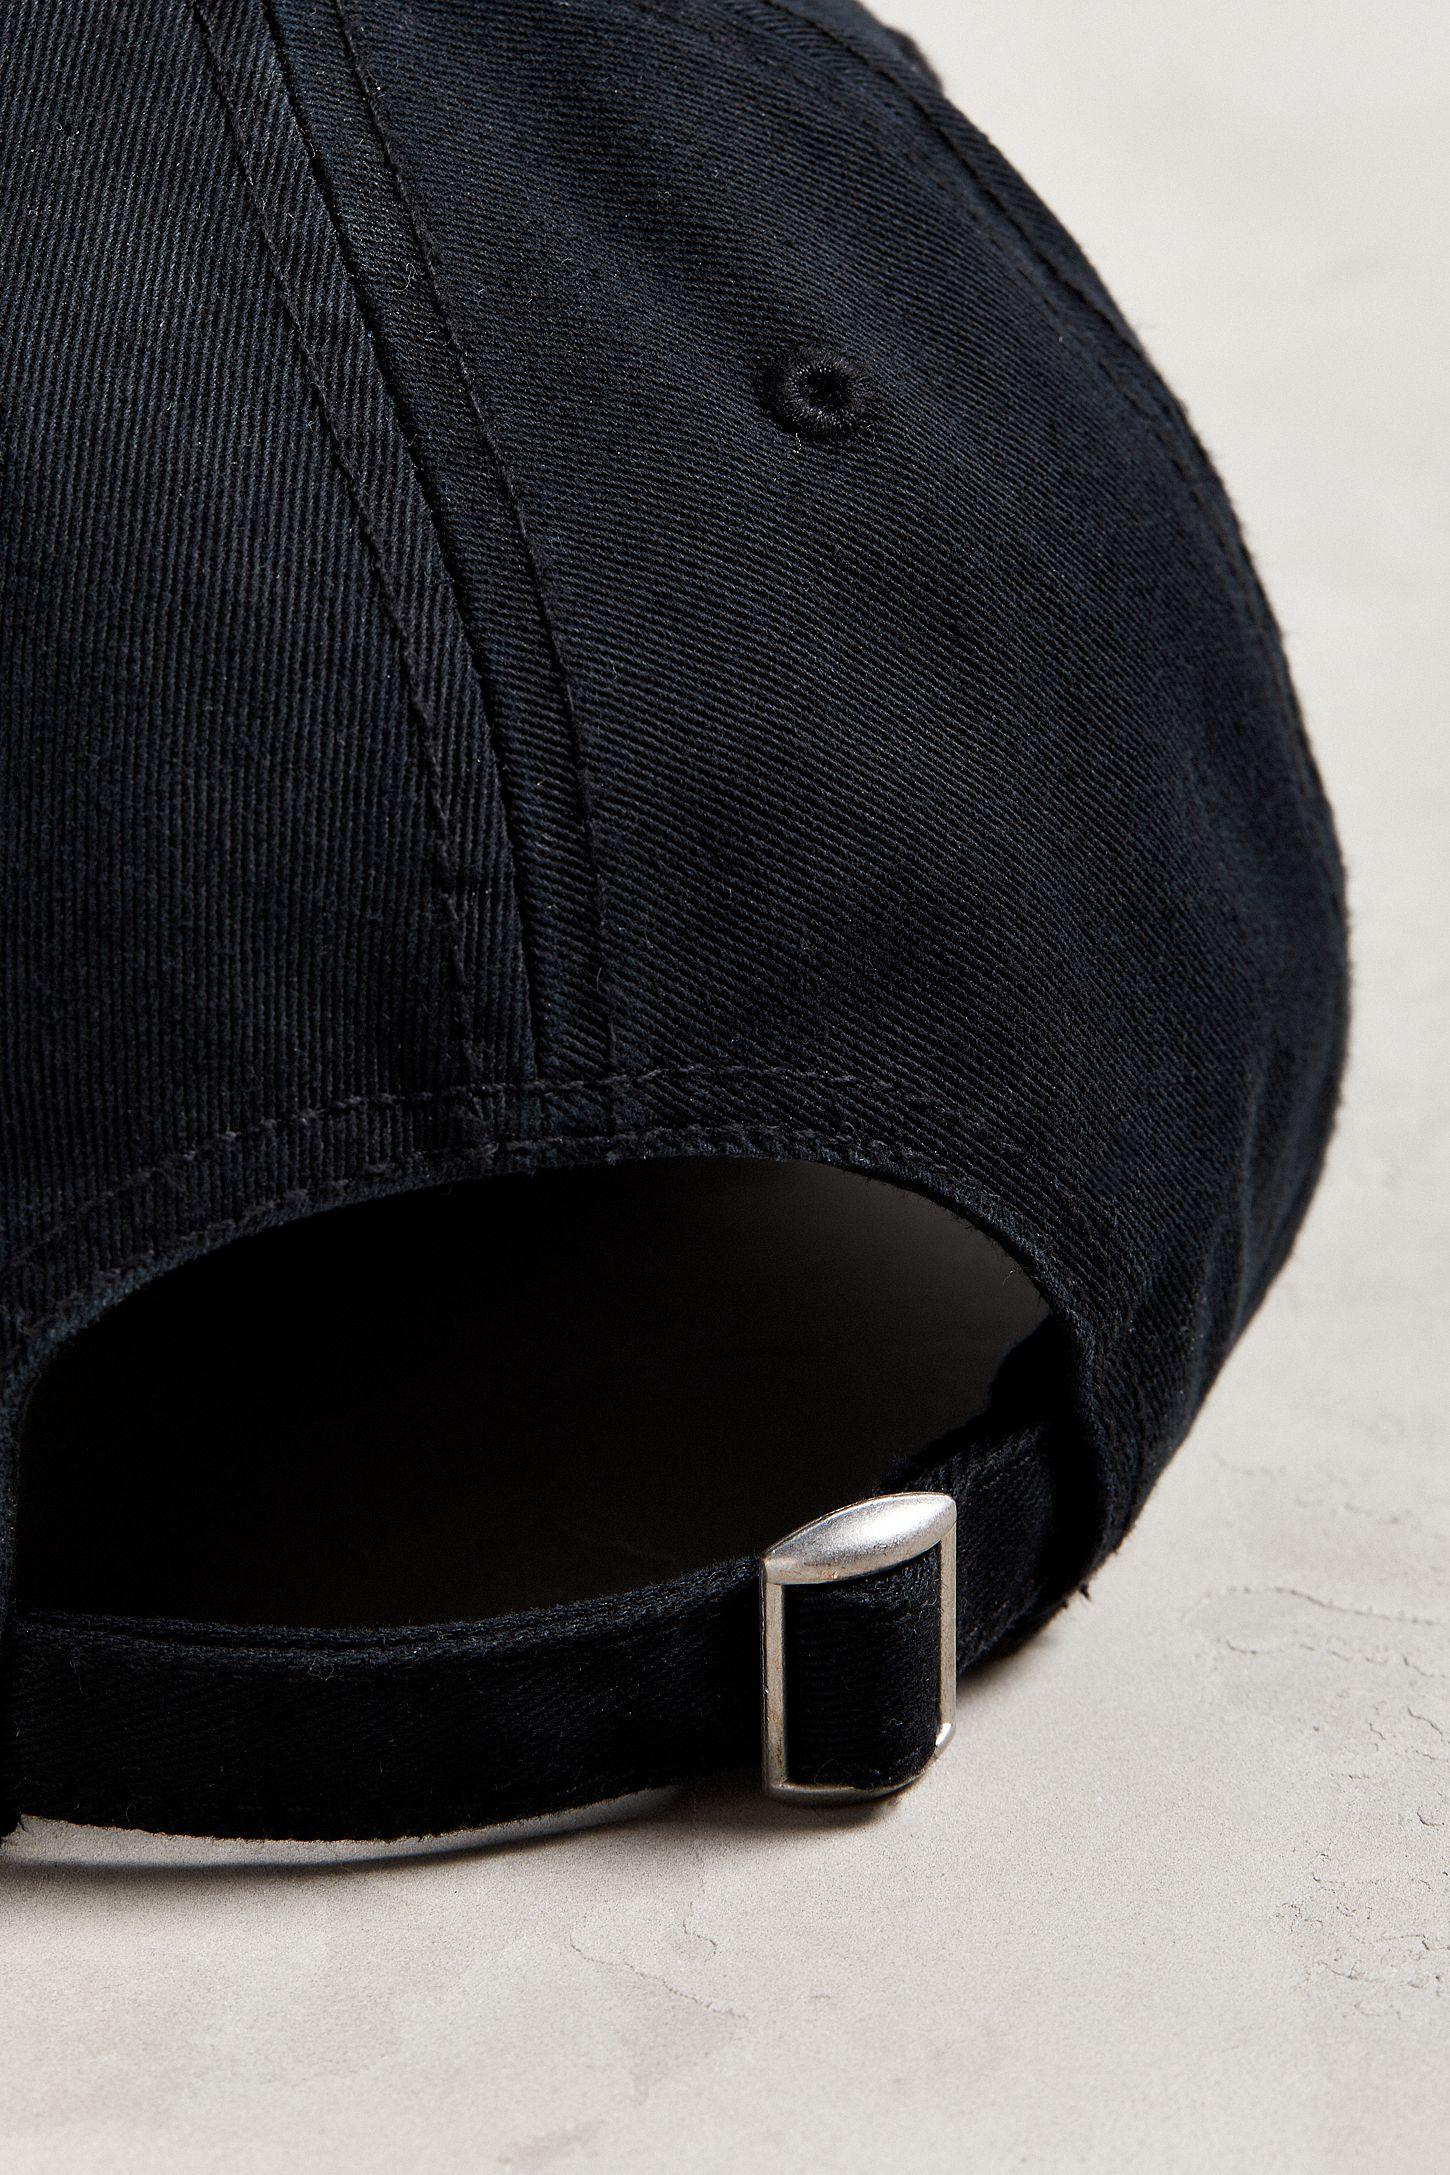 ade14a2b692da Nasa Hats - Latest and Best Hat Models